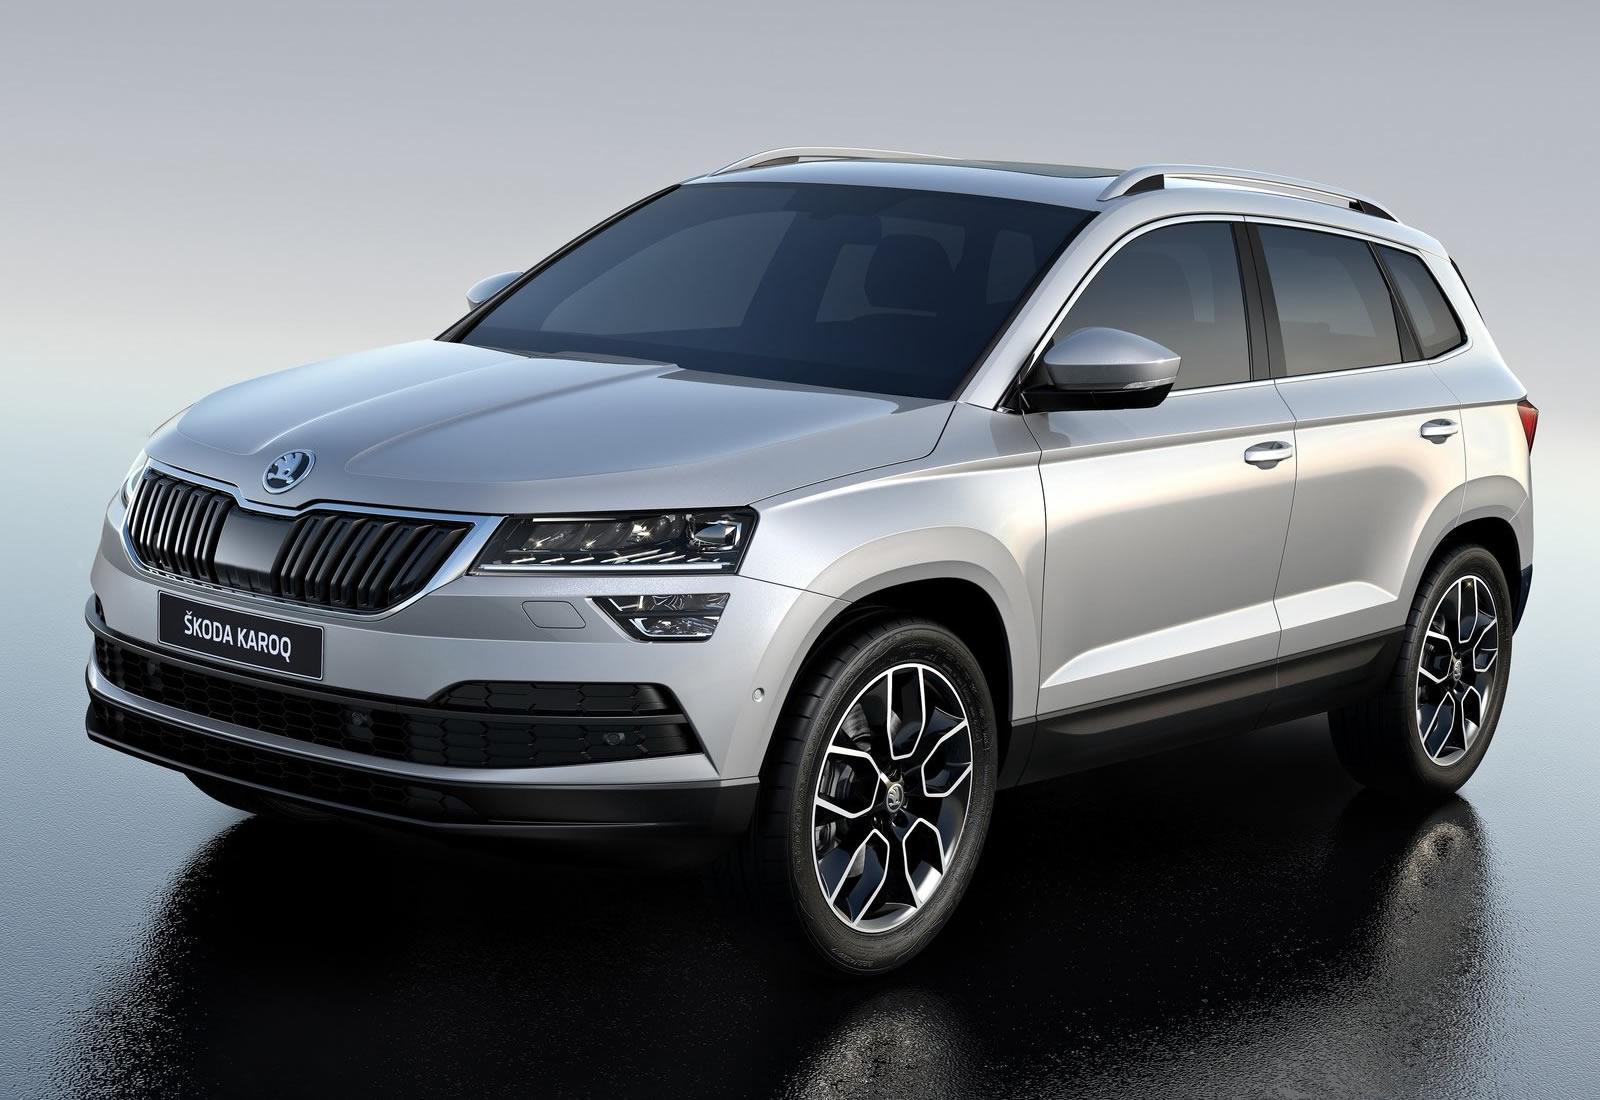 Škoda Karoq 2018